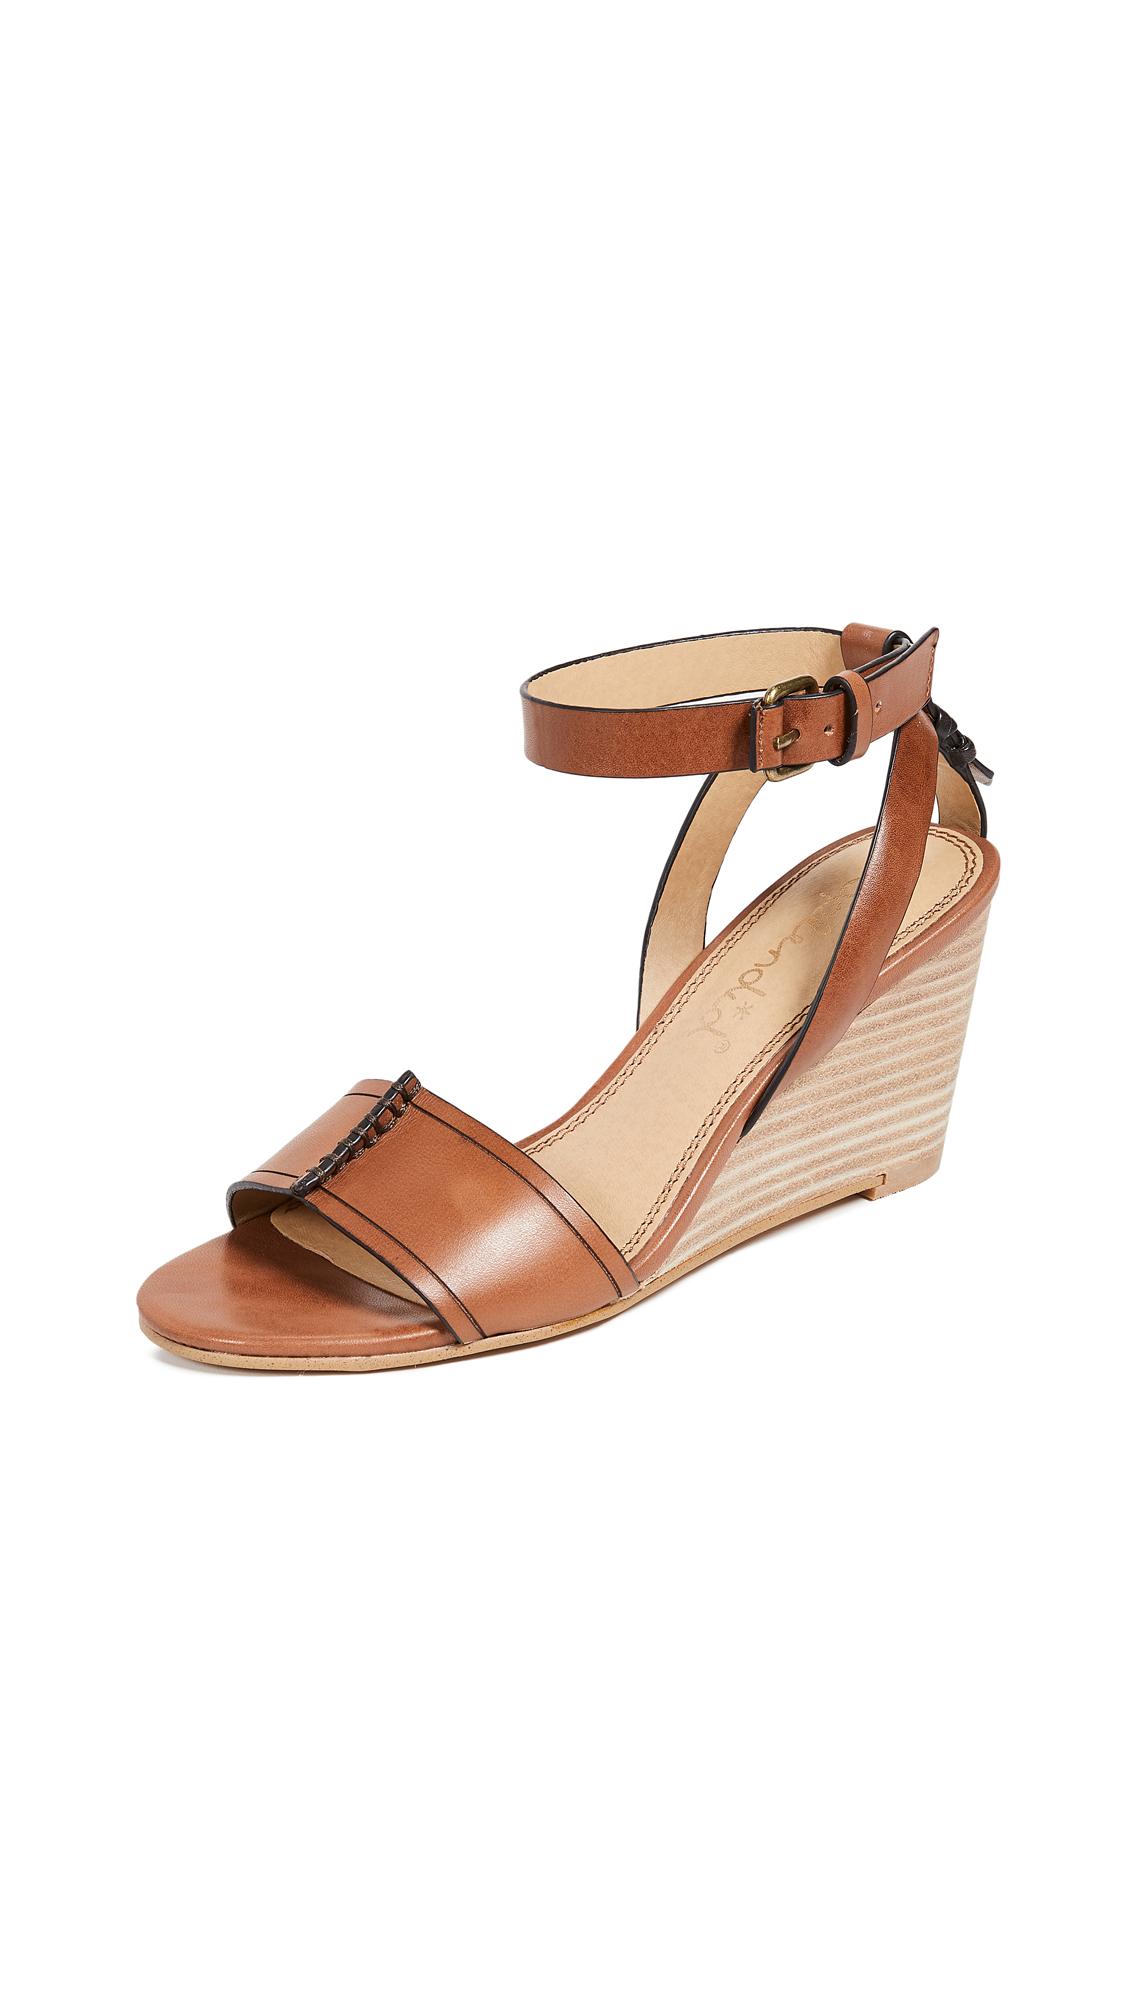 Splendid Tadeo Wedge Sandals - Brick